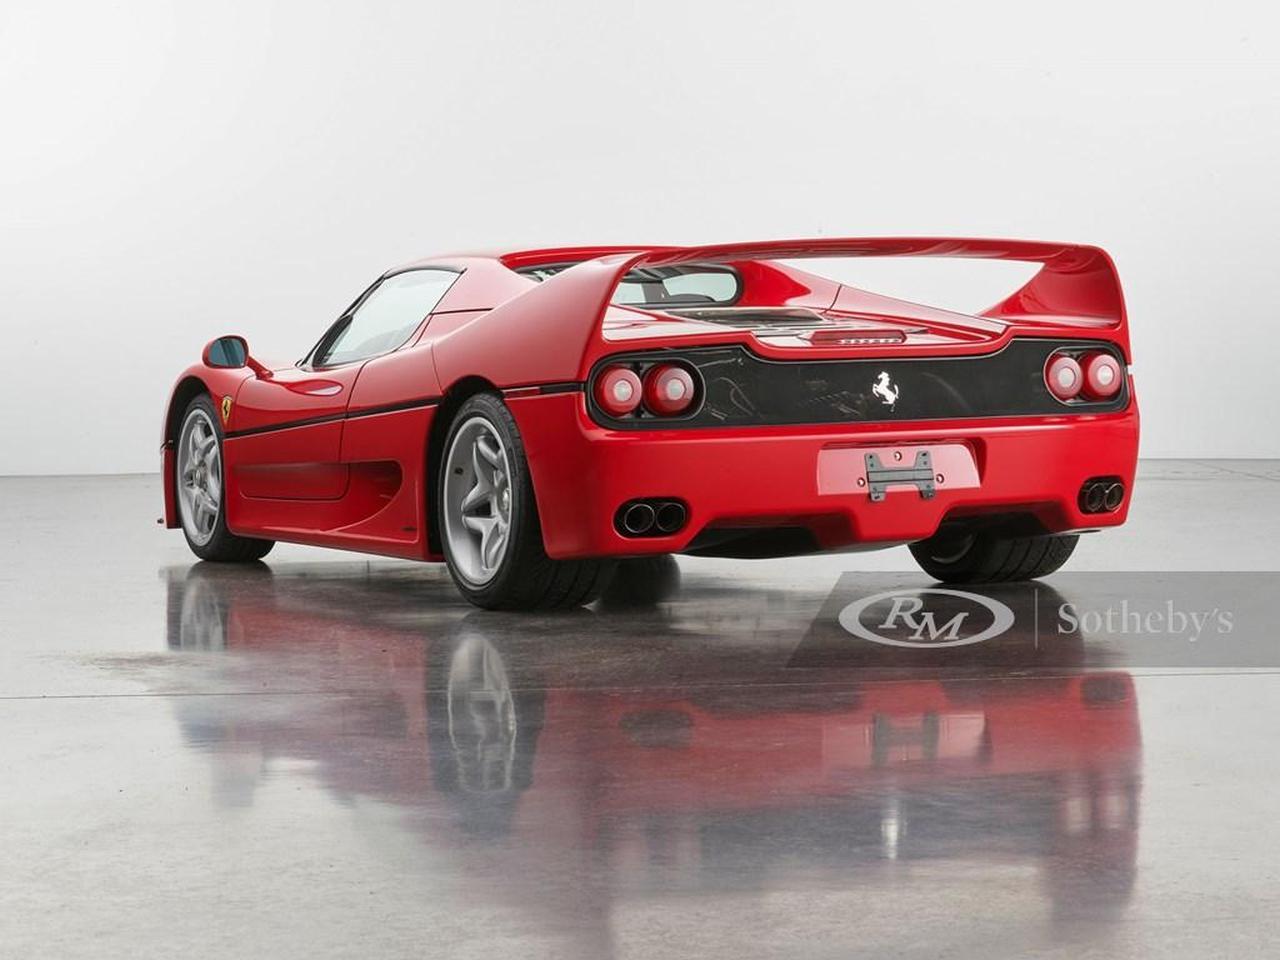 Ferrari F50-RM-Sothebys-2021-auction-2